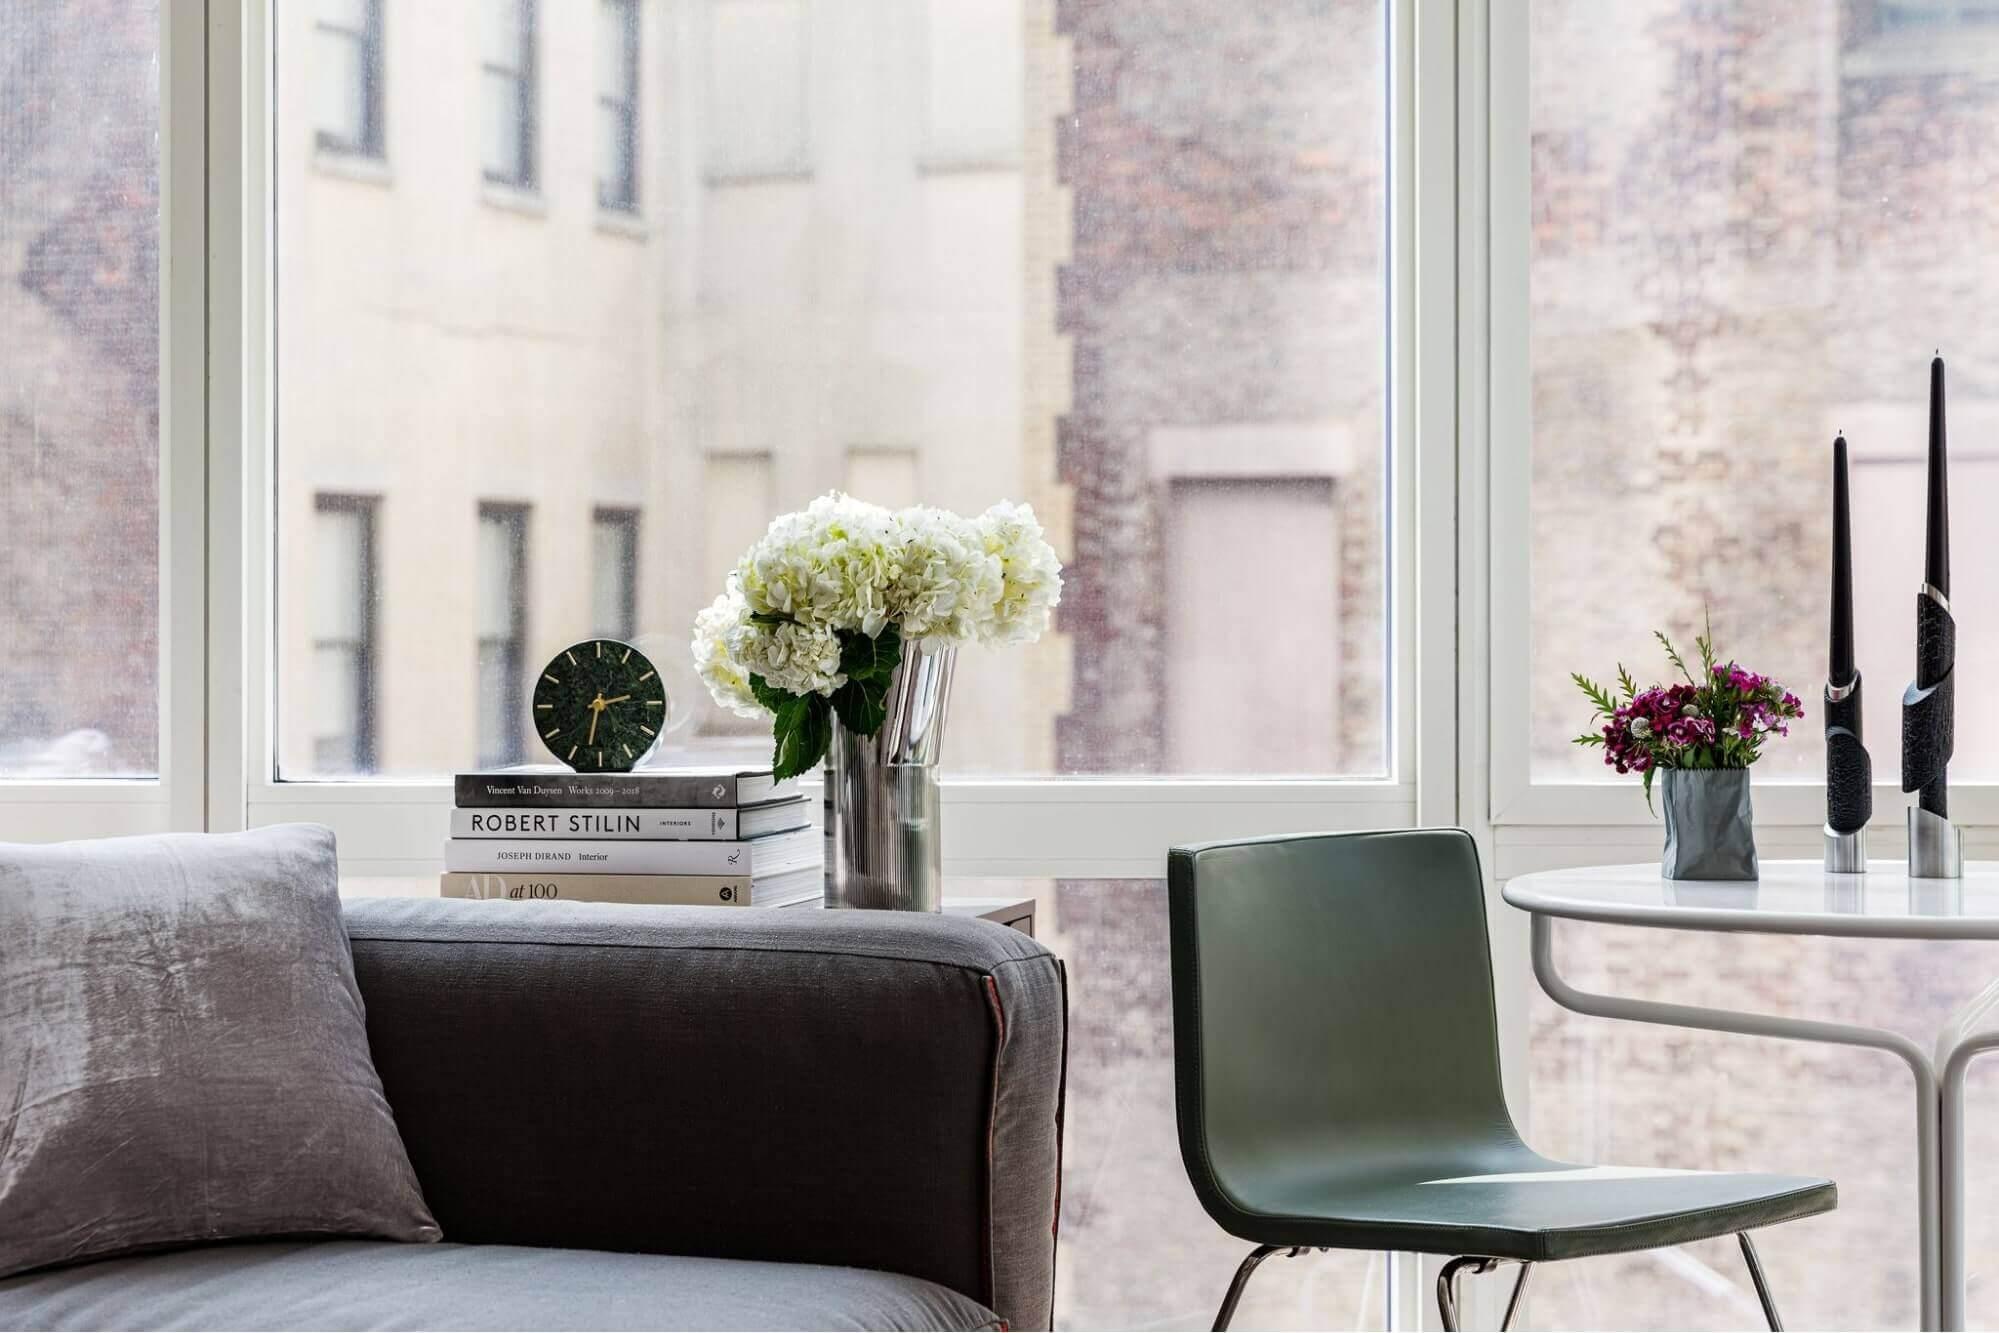 warm home's interior